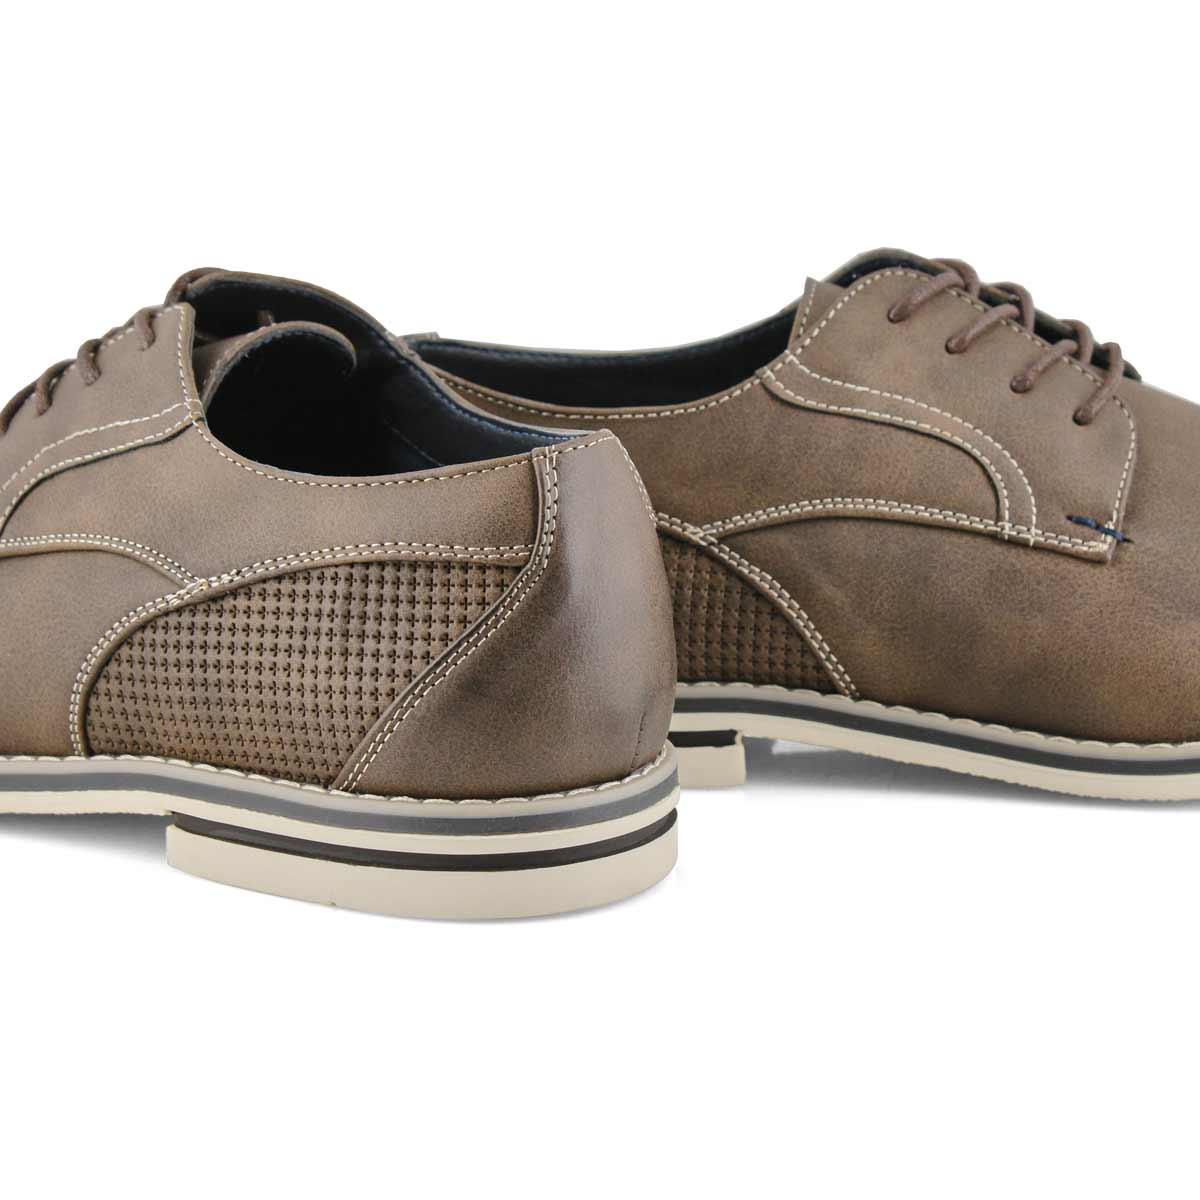 Men's Jack2 Casual Shoe - Cognac